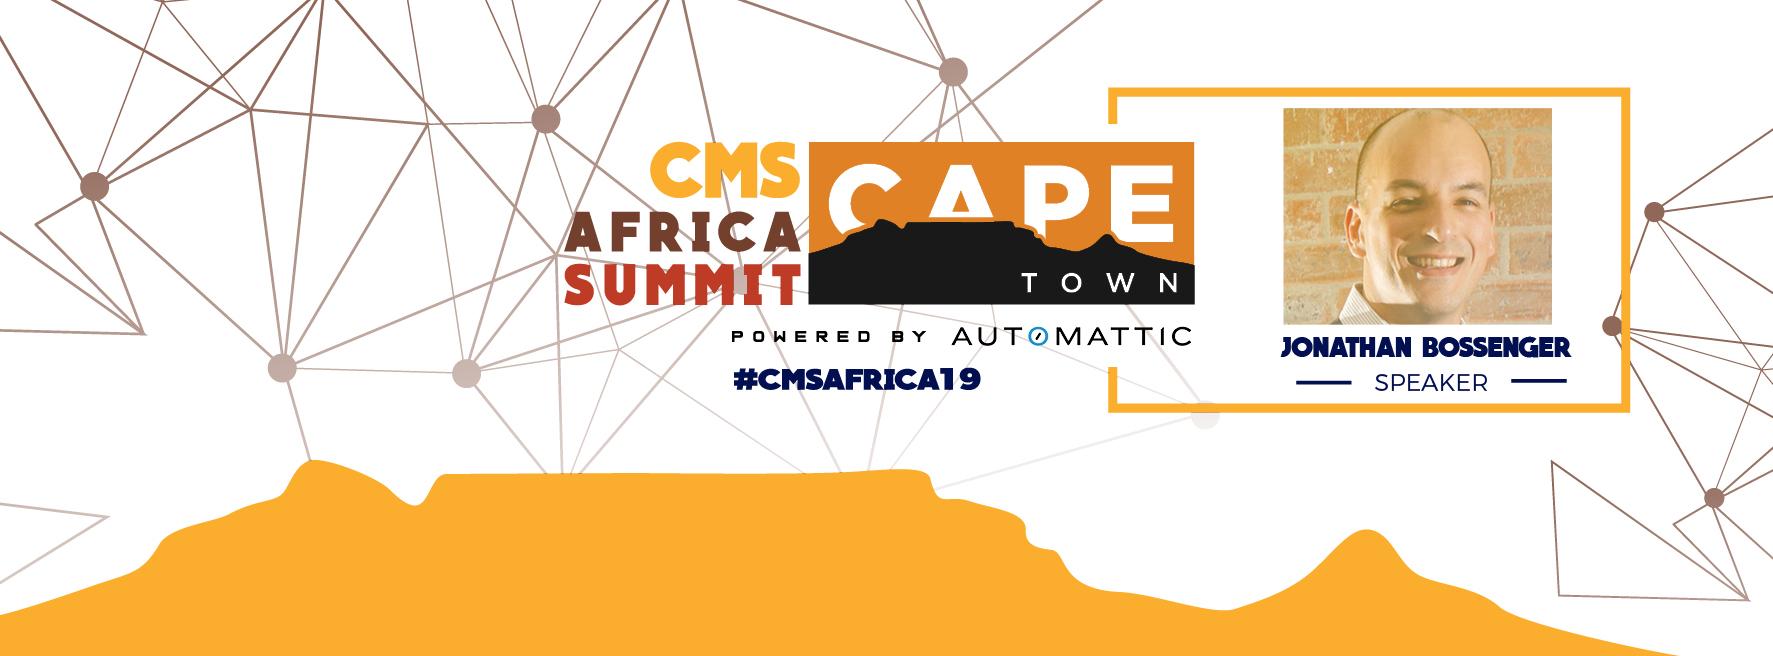 CMS Africa